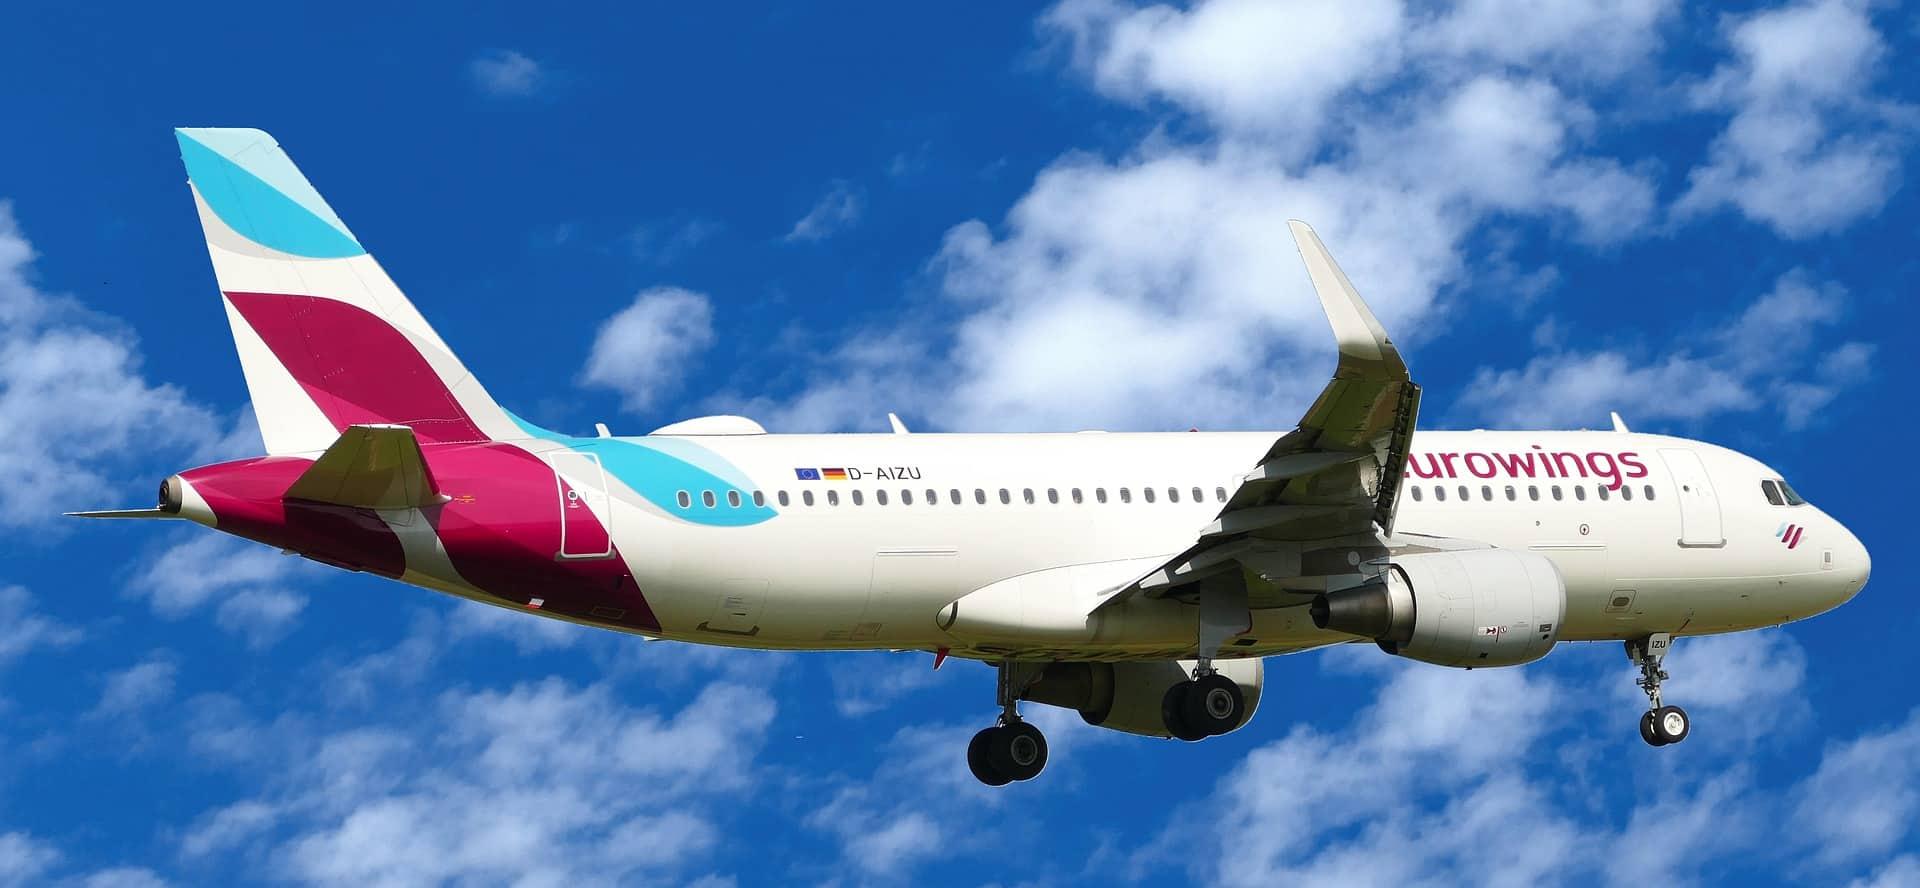 Flug ab Saarbrücken nach Palma de Mallorca im Sale % ab 24,99€